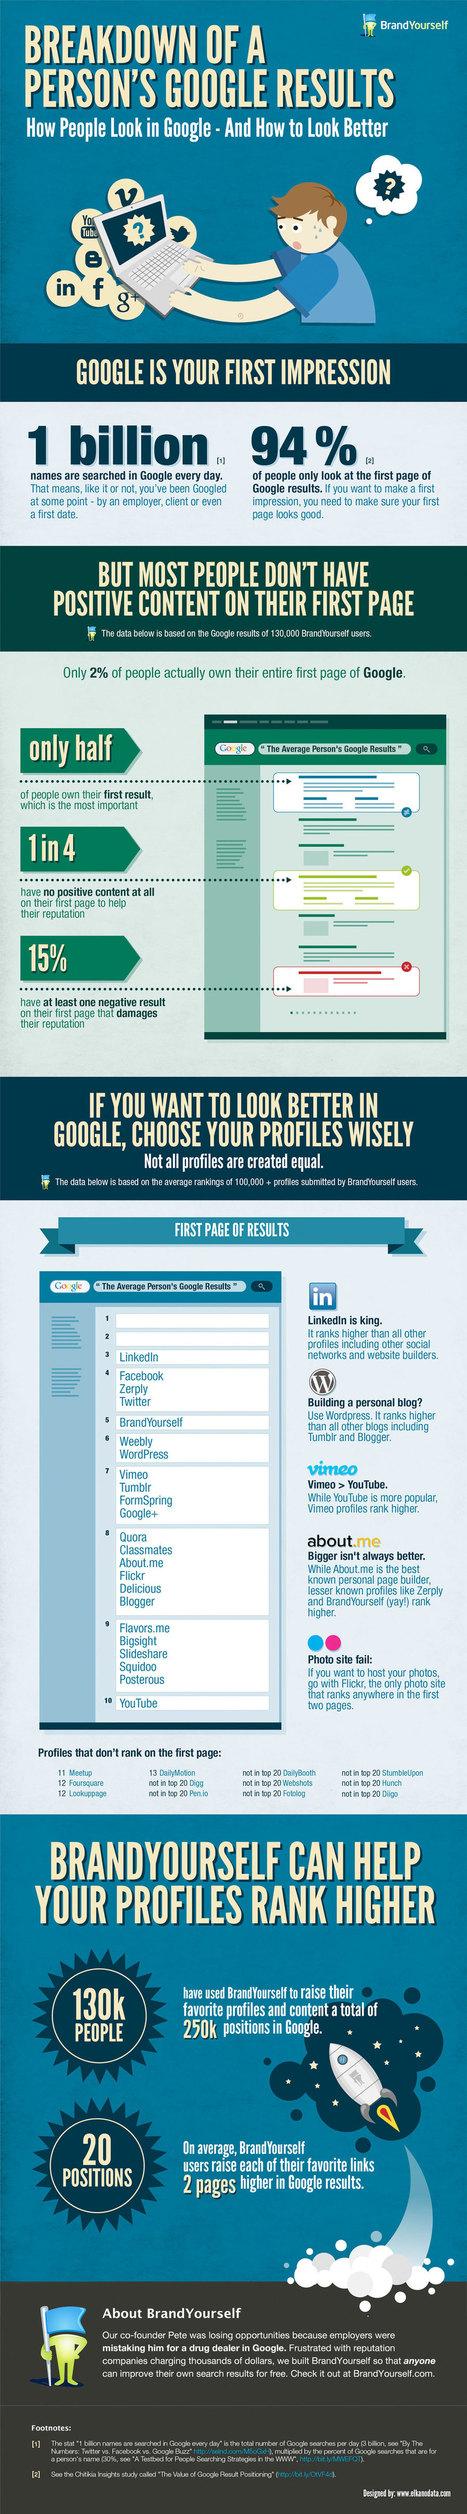 infographic47.jpg (1058x5695 pixels) | Digital Society | Scoop.it